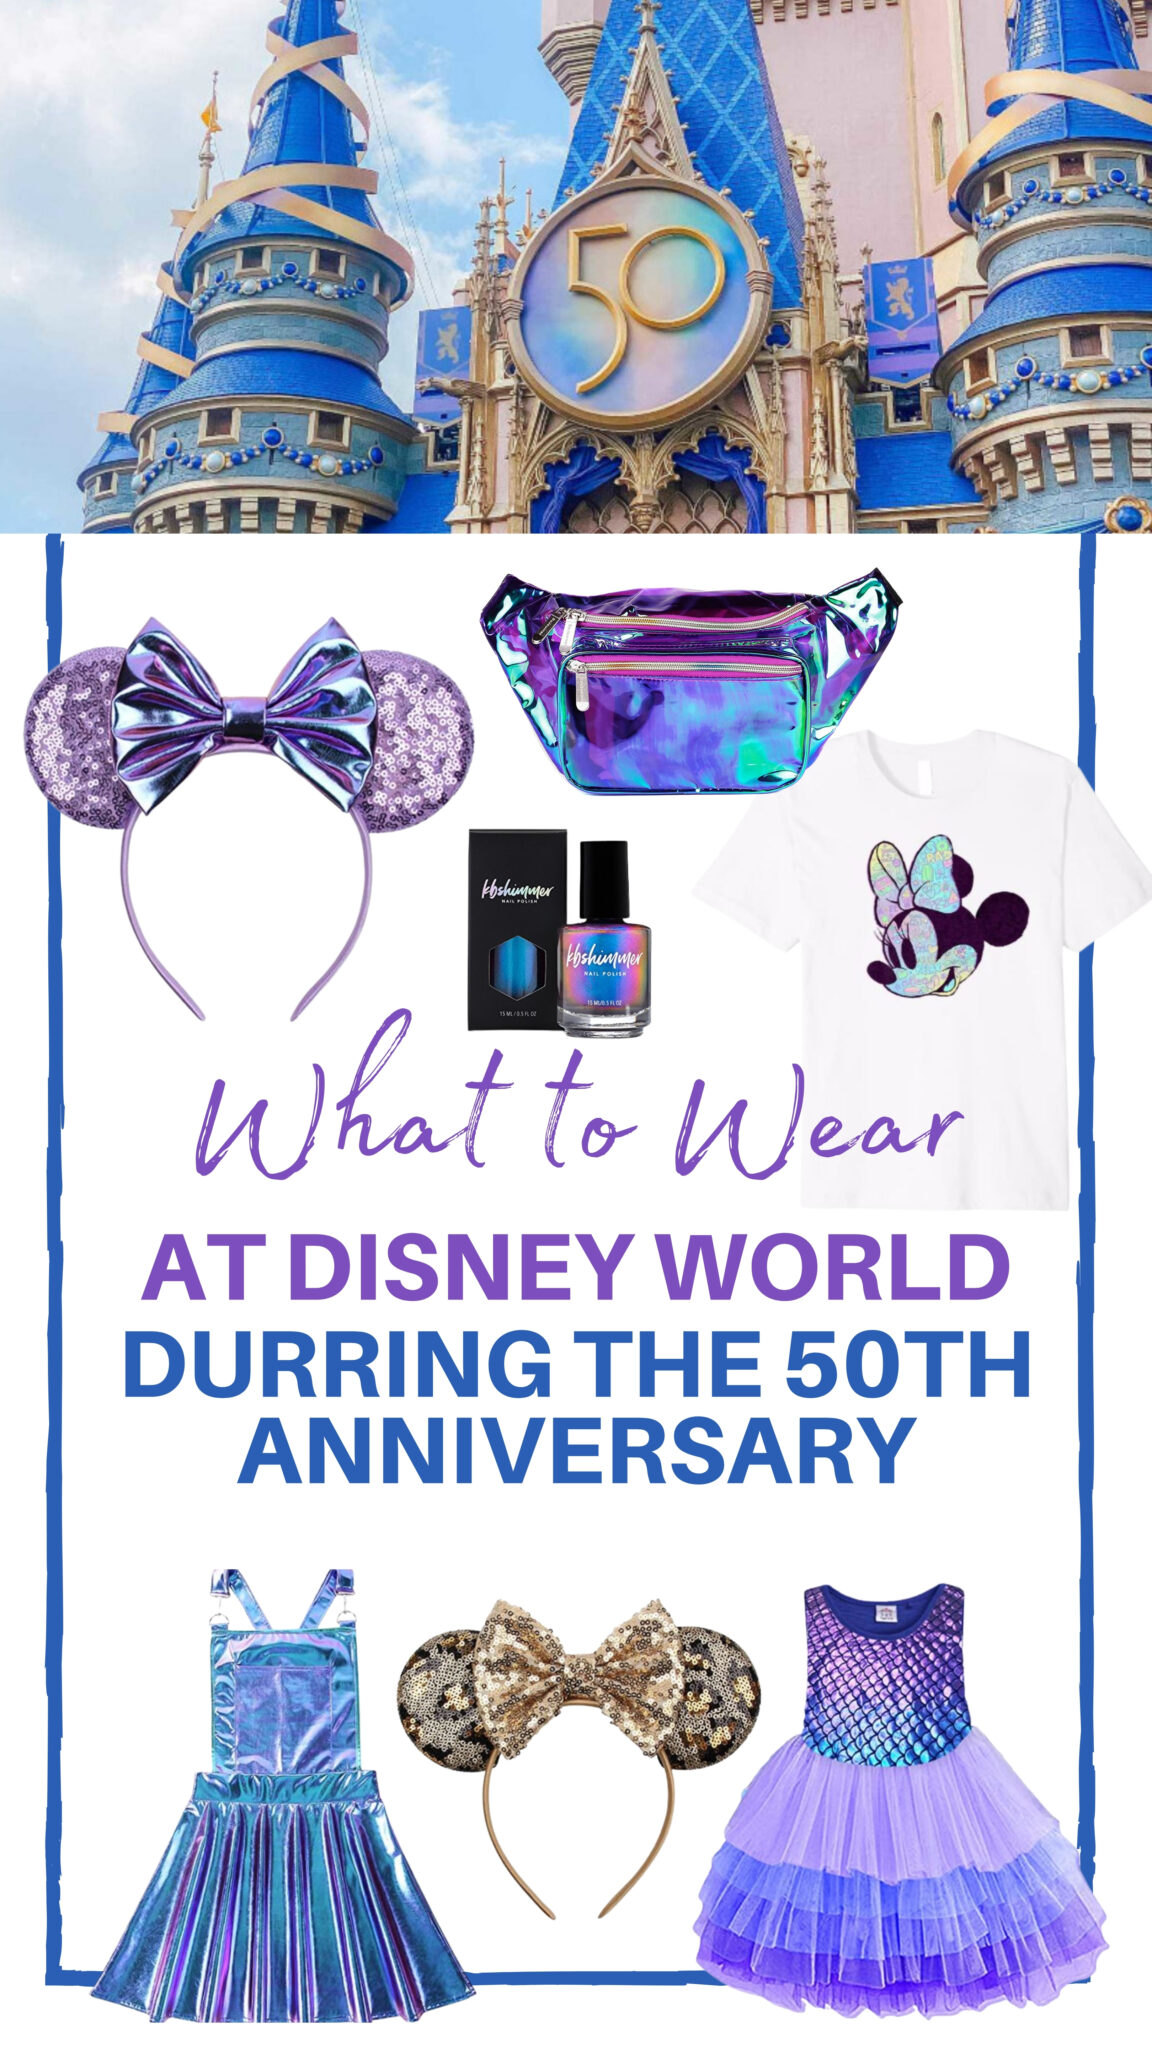 Walt Disney World 50th Anniversary Earidescent Themed Attire Found on Amazon All Things with Purpose Sarah Lemp 2